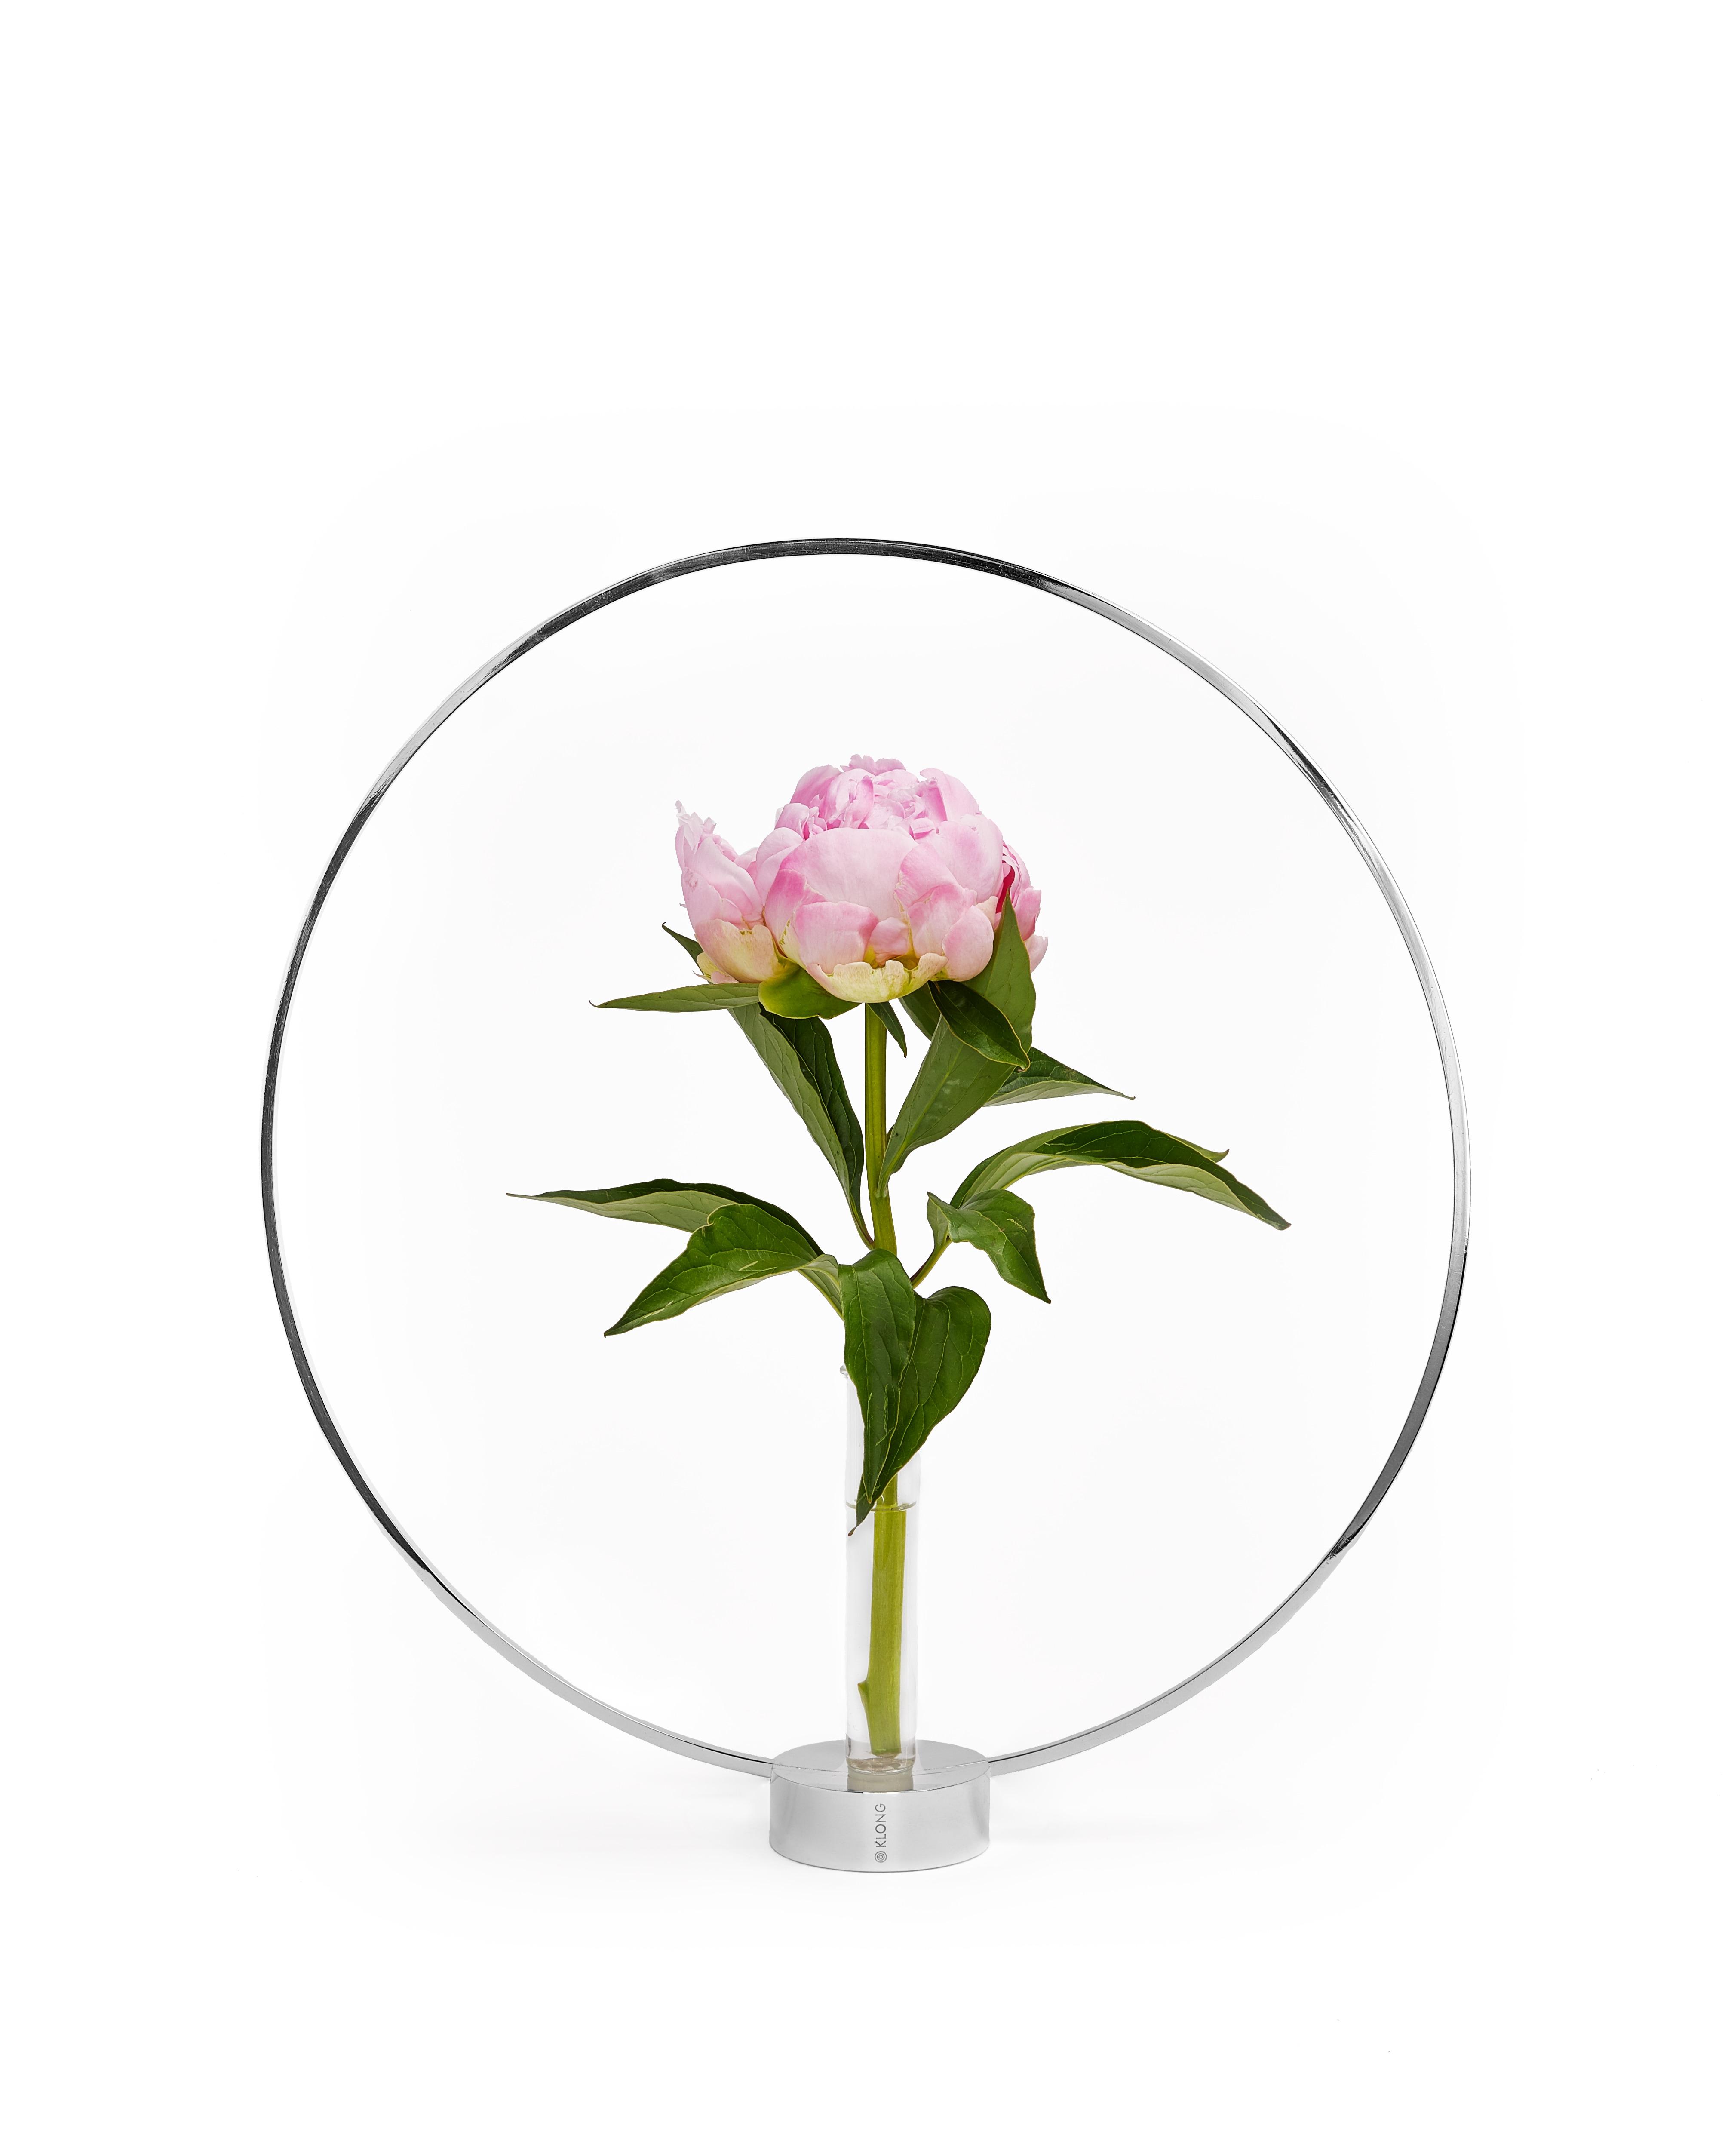 Gloria stor silver med blomma